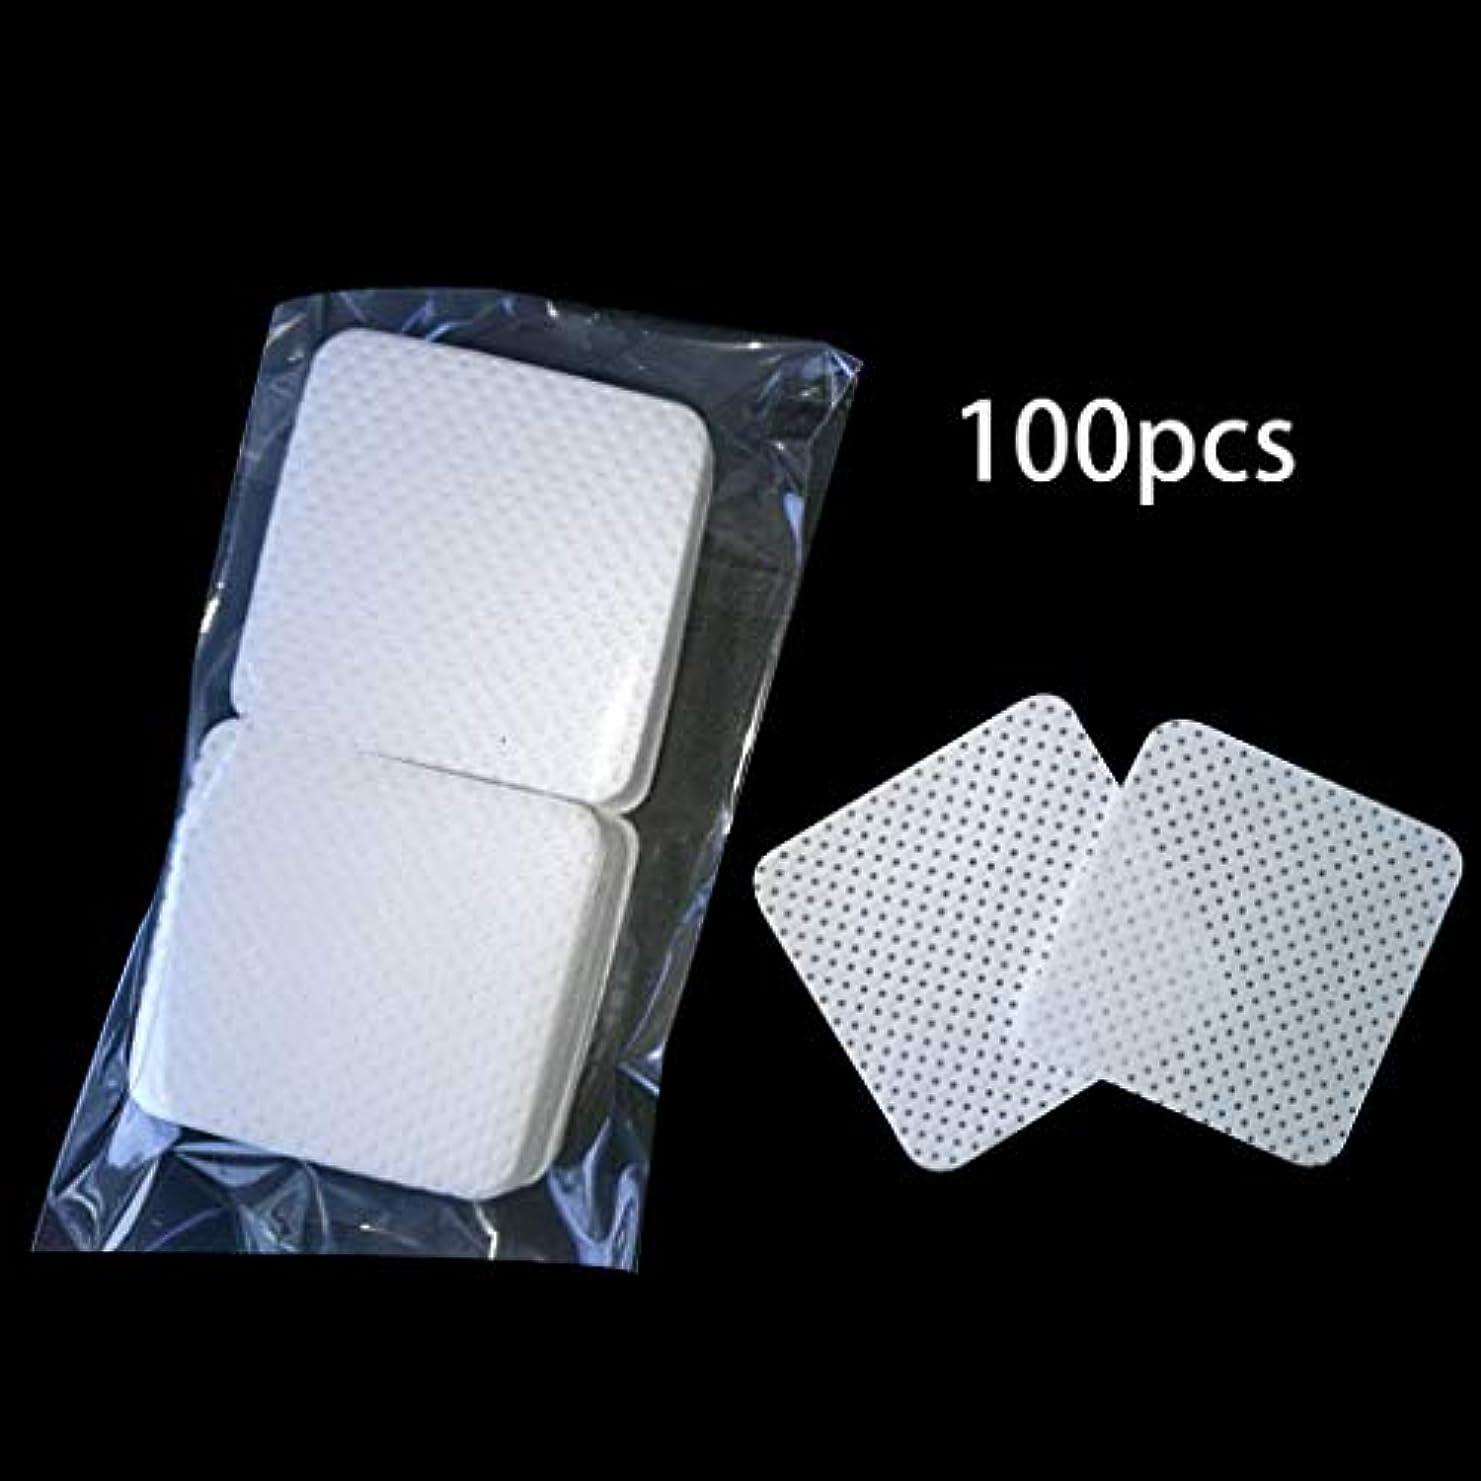 Lamdoo 100ピース/バッグ使い捨てまつげエクステンション接着剤削除綿パッド瓶口拭きパッチメイク化粧品クリーニングツール